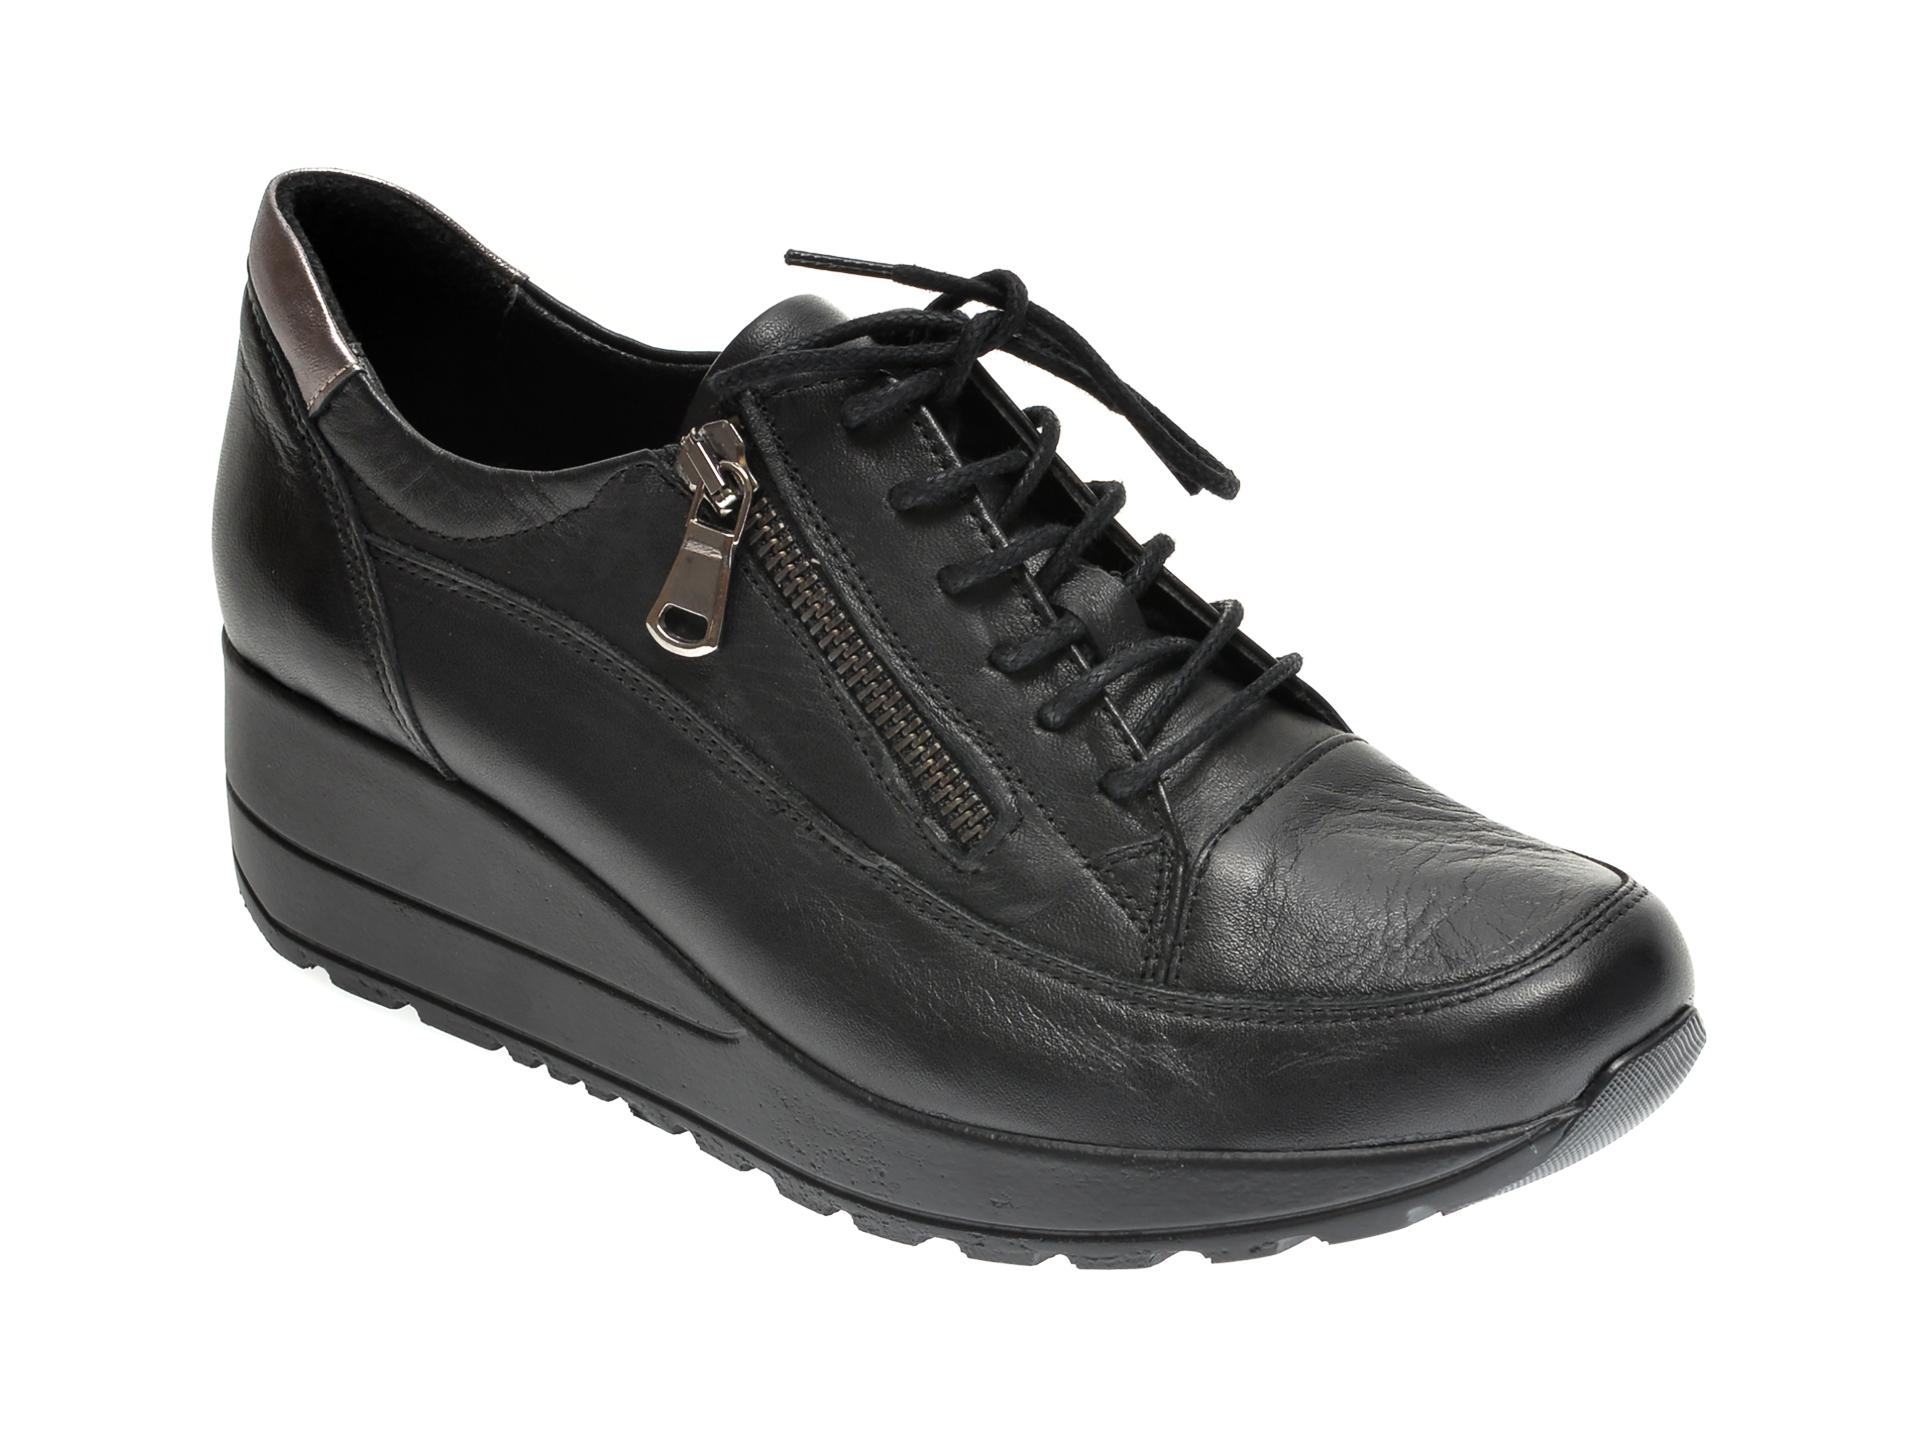 Pantofi ILOZ negri, 213, din piele naturala imagine